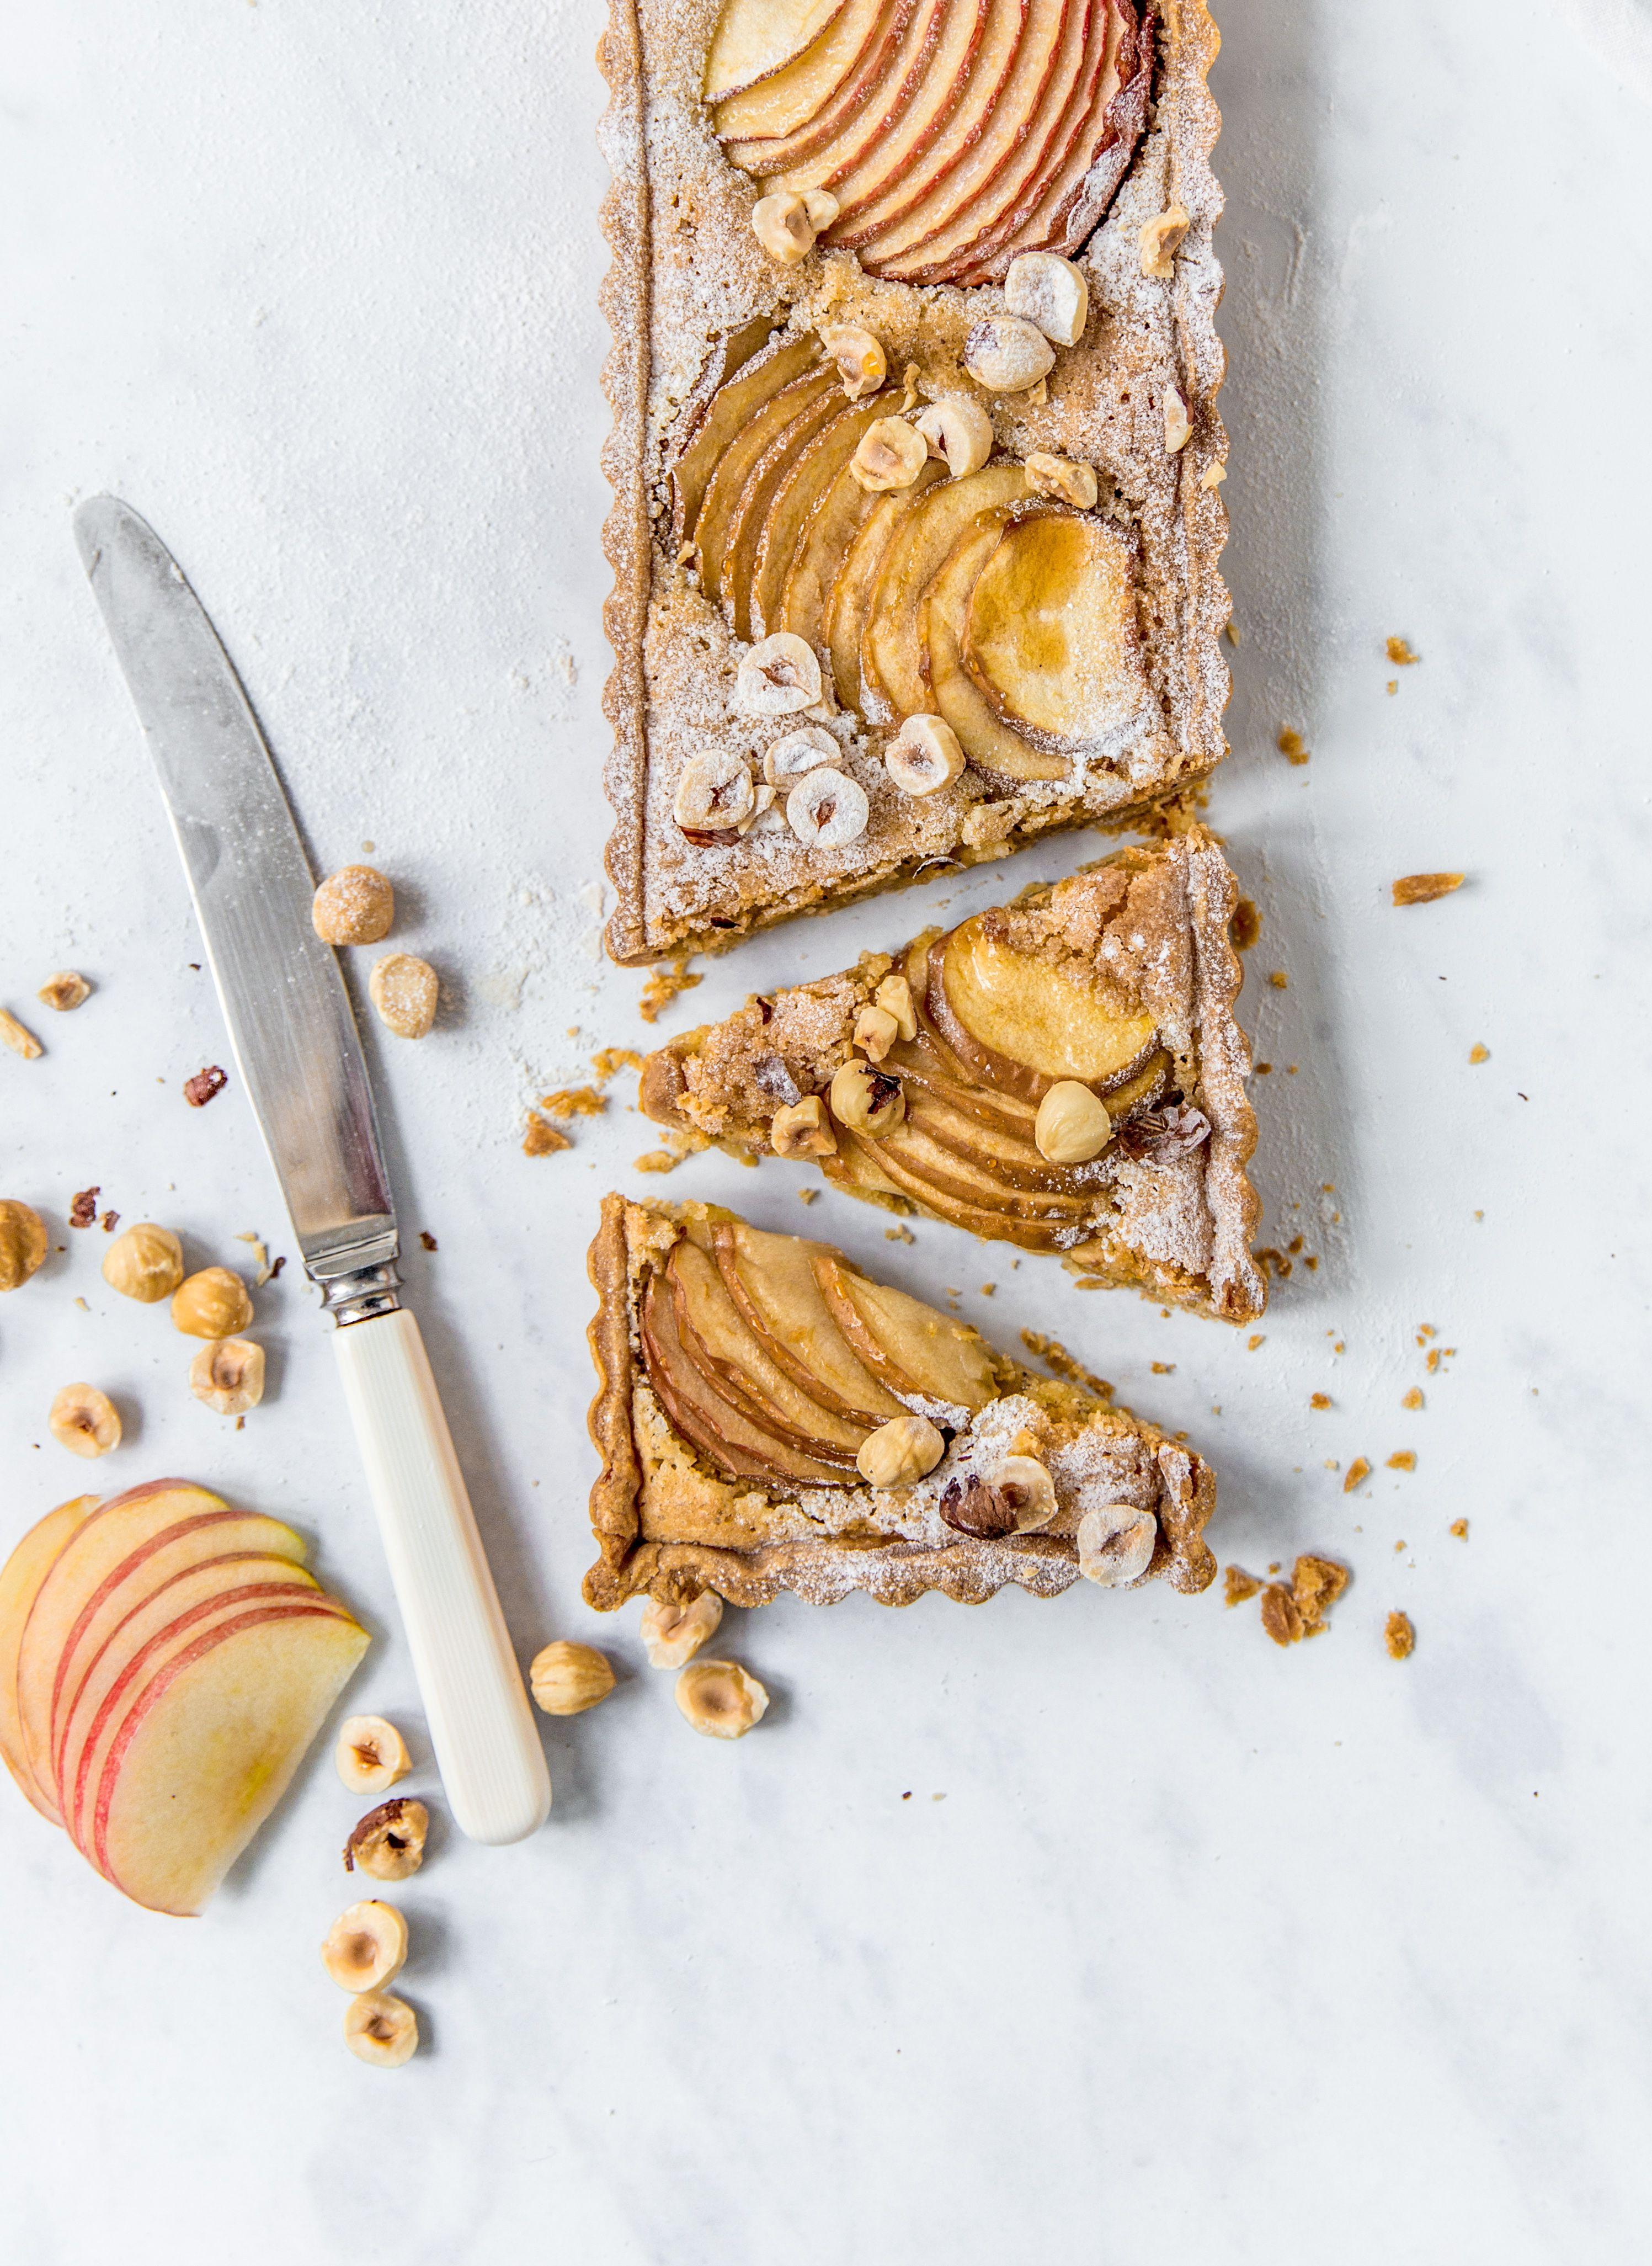 Apple Frangipane Tart Frangipane Tart Sweet Treats Recipes Baking Sweet